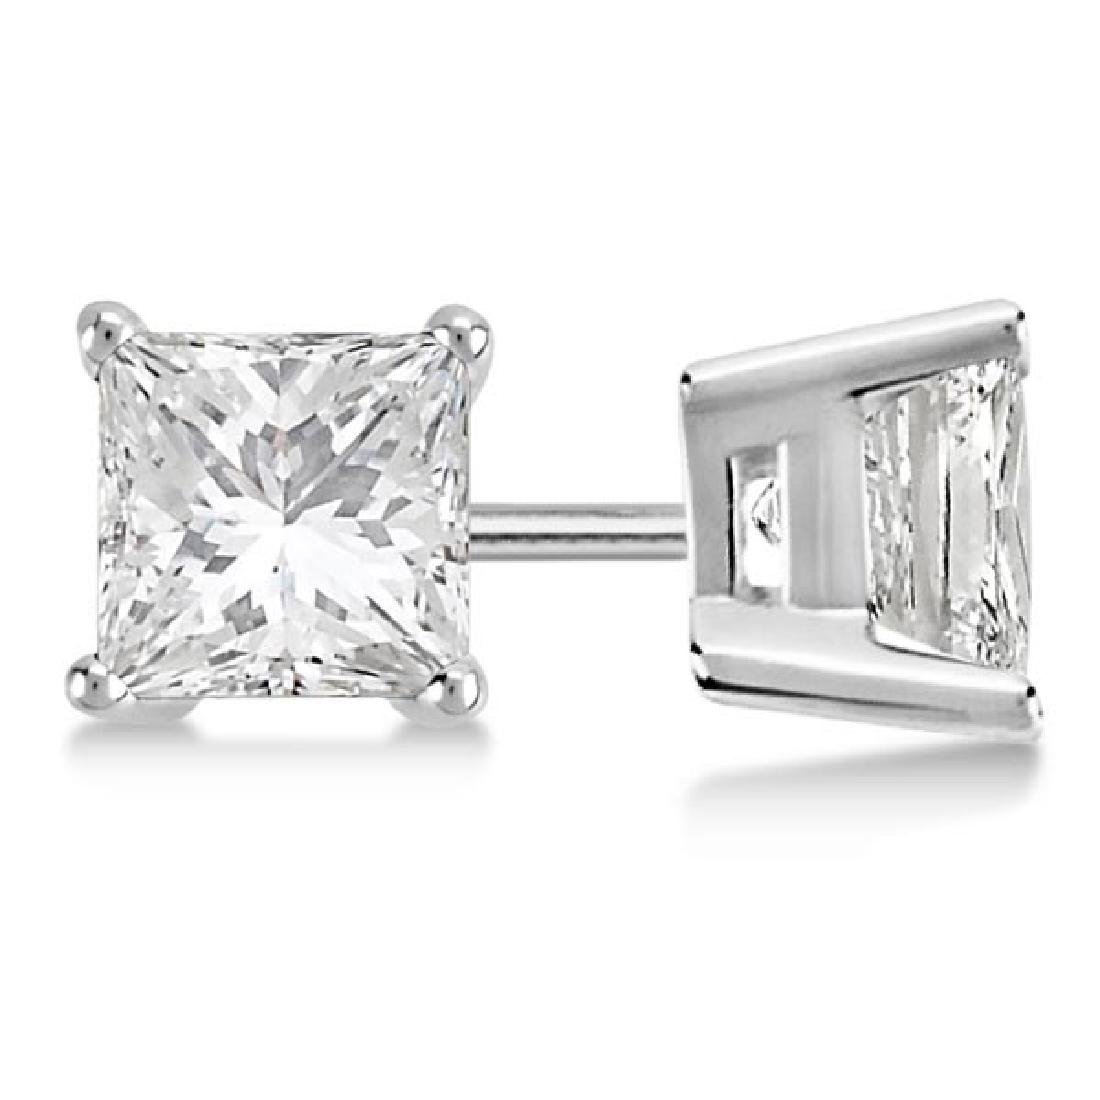 Certified 1.21 CTW Princess Diamond Stud Earrings D/SI3